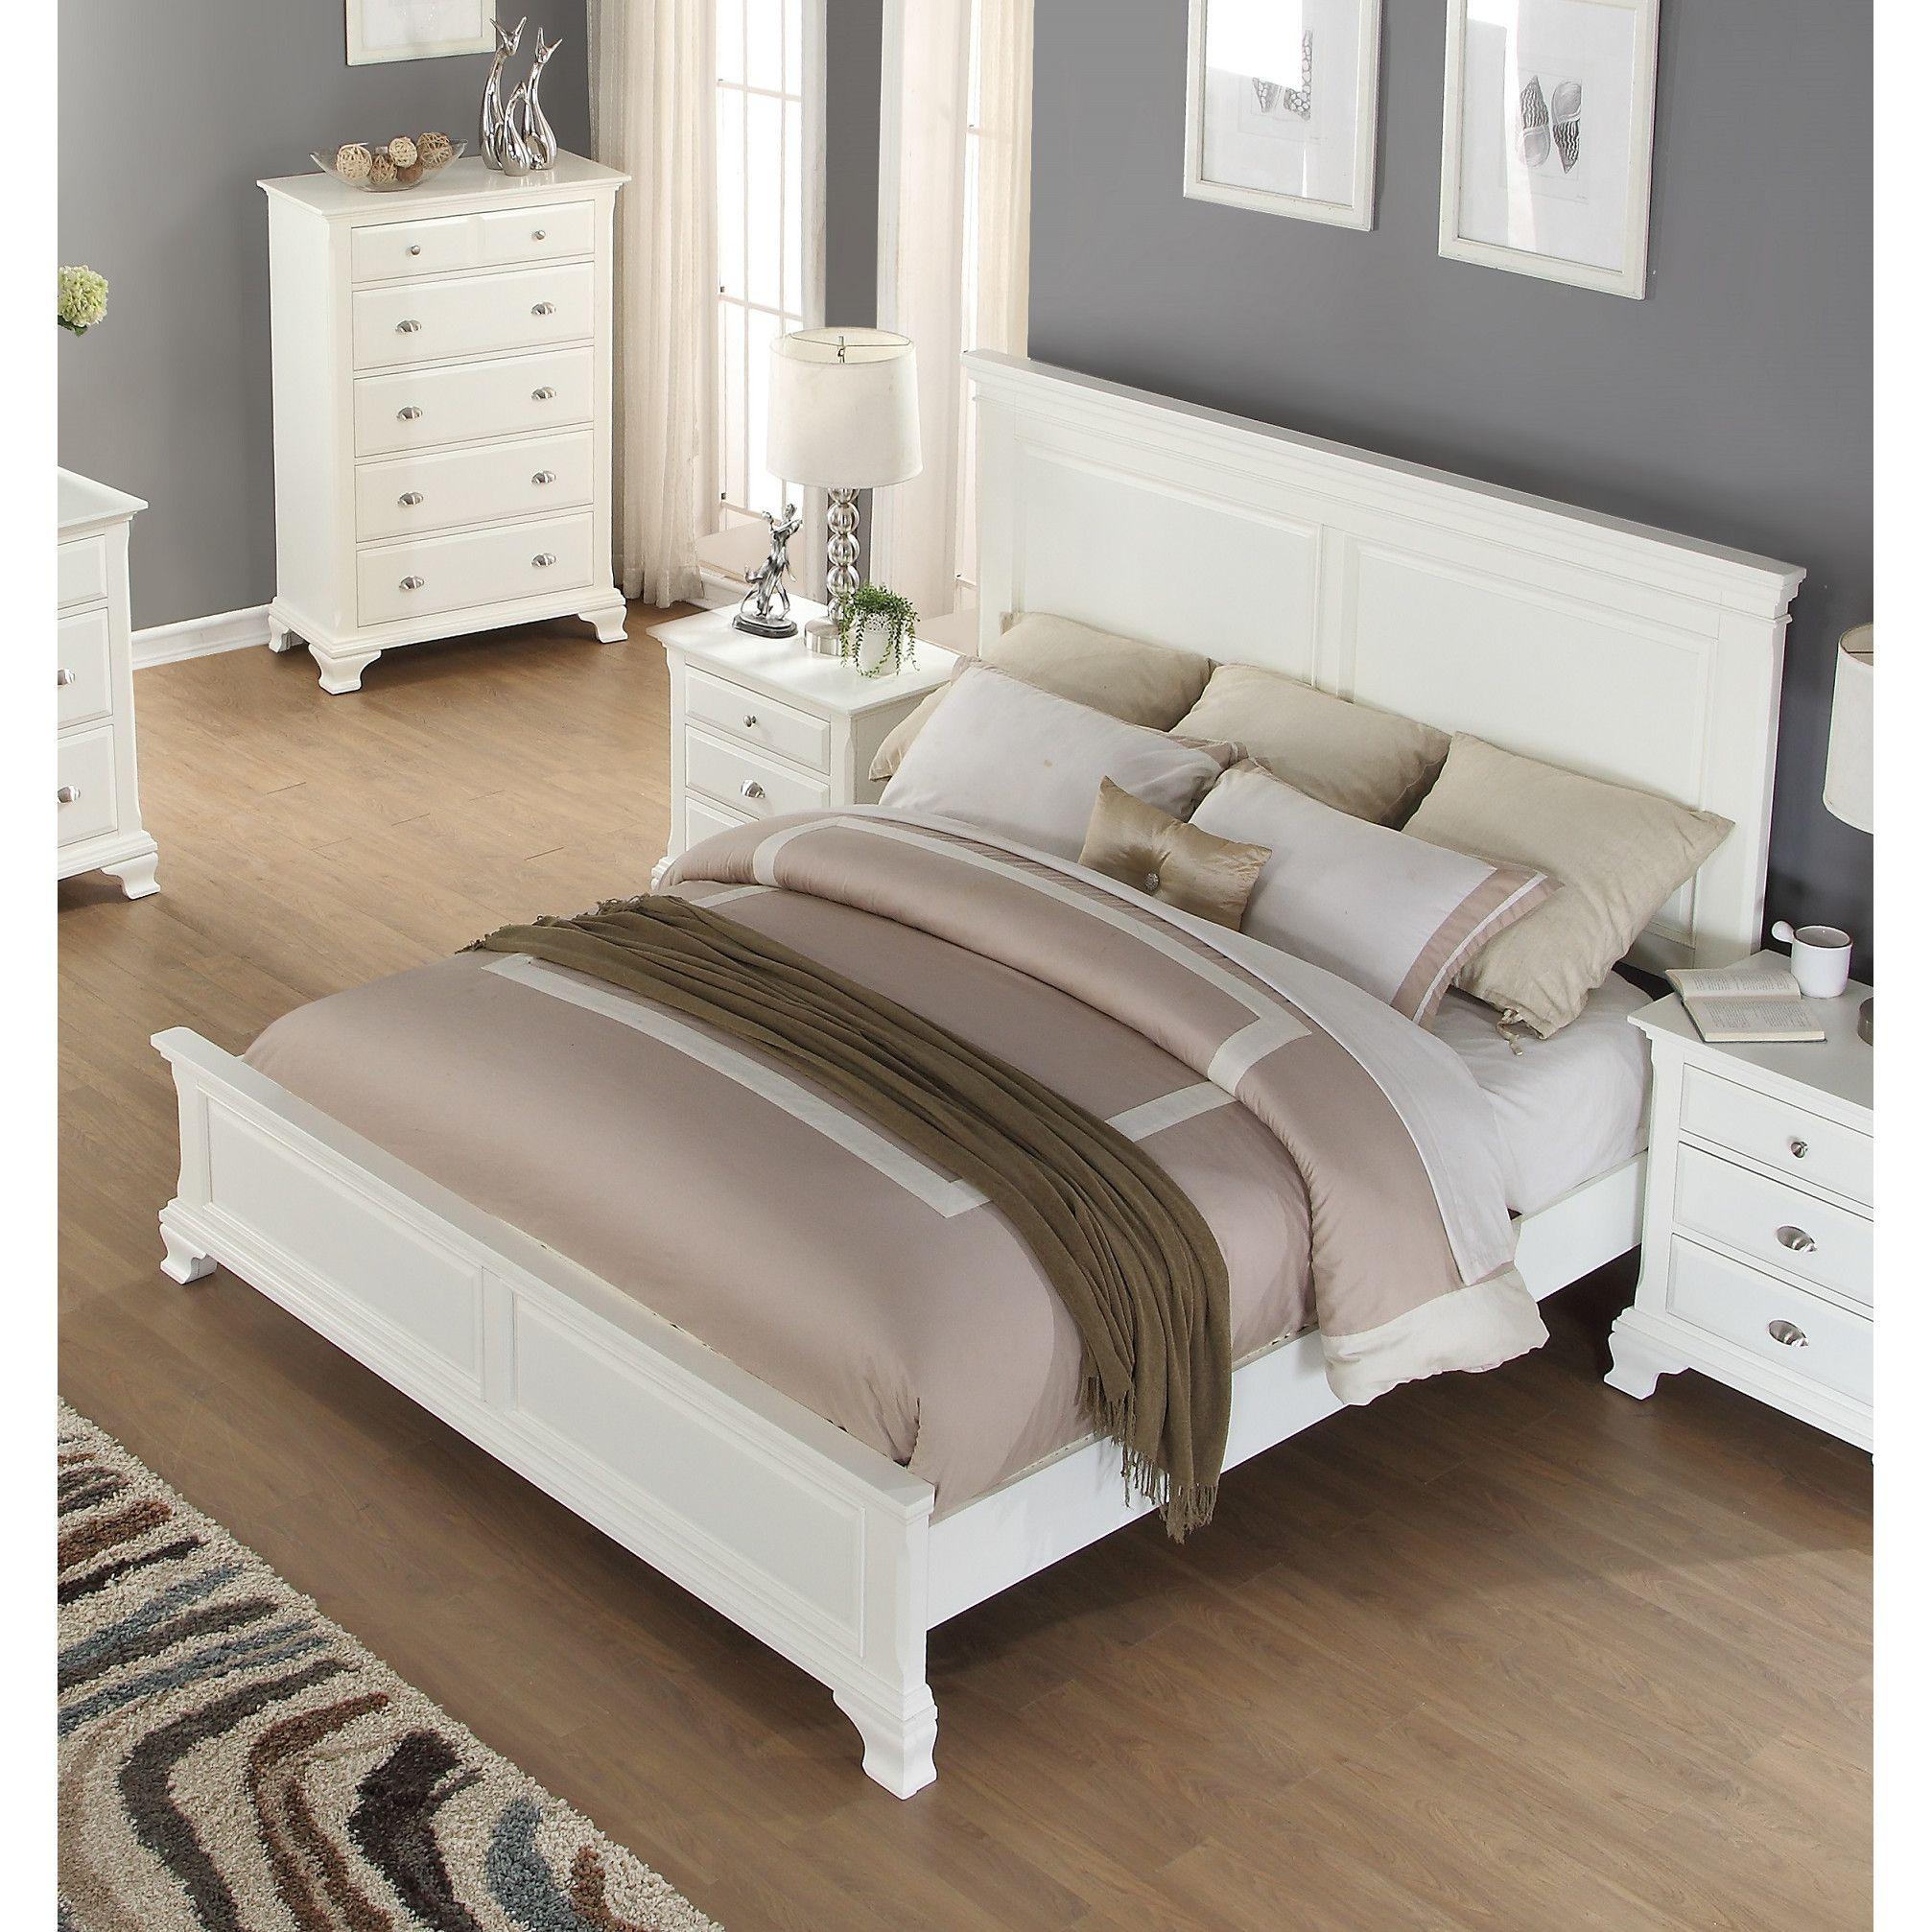 Darby Home Co Fellsburg Panel Bed & Reviews Birch Lane